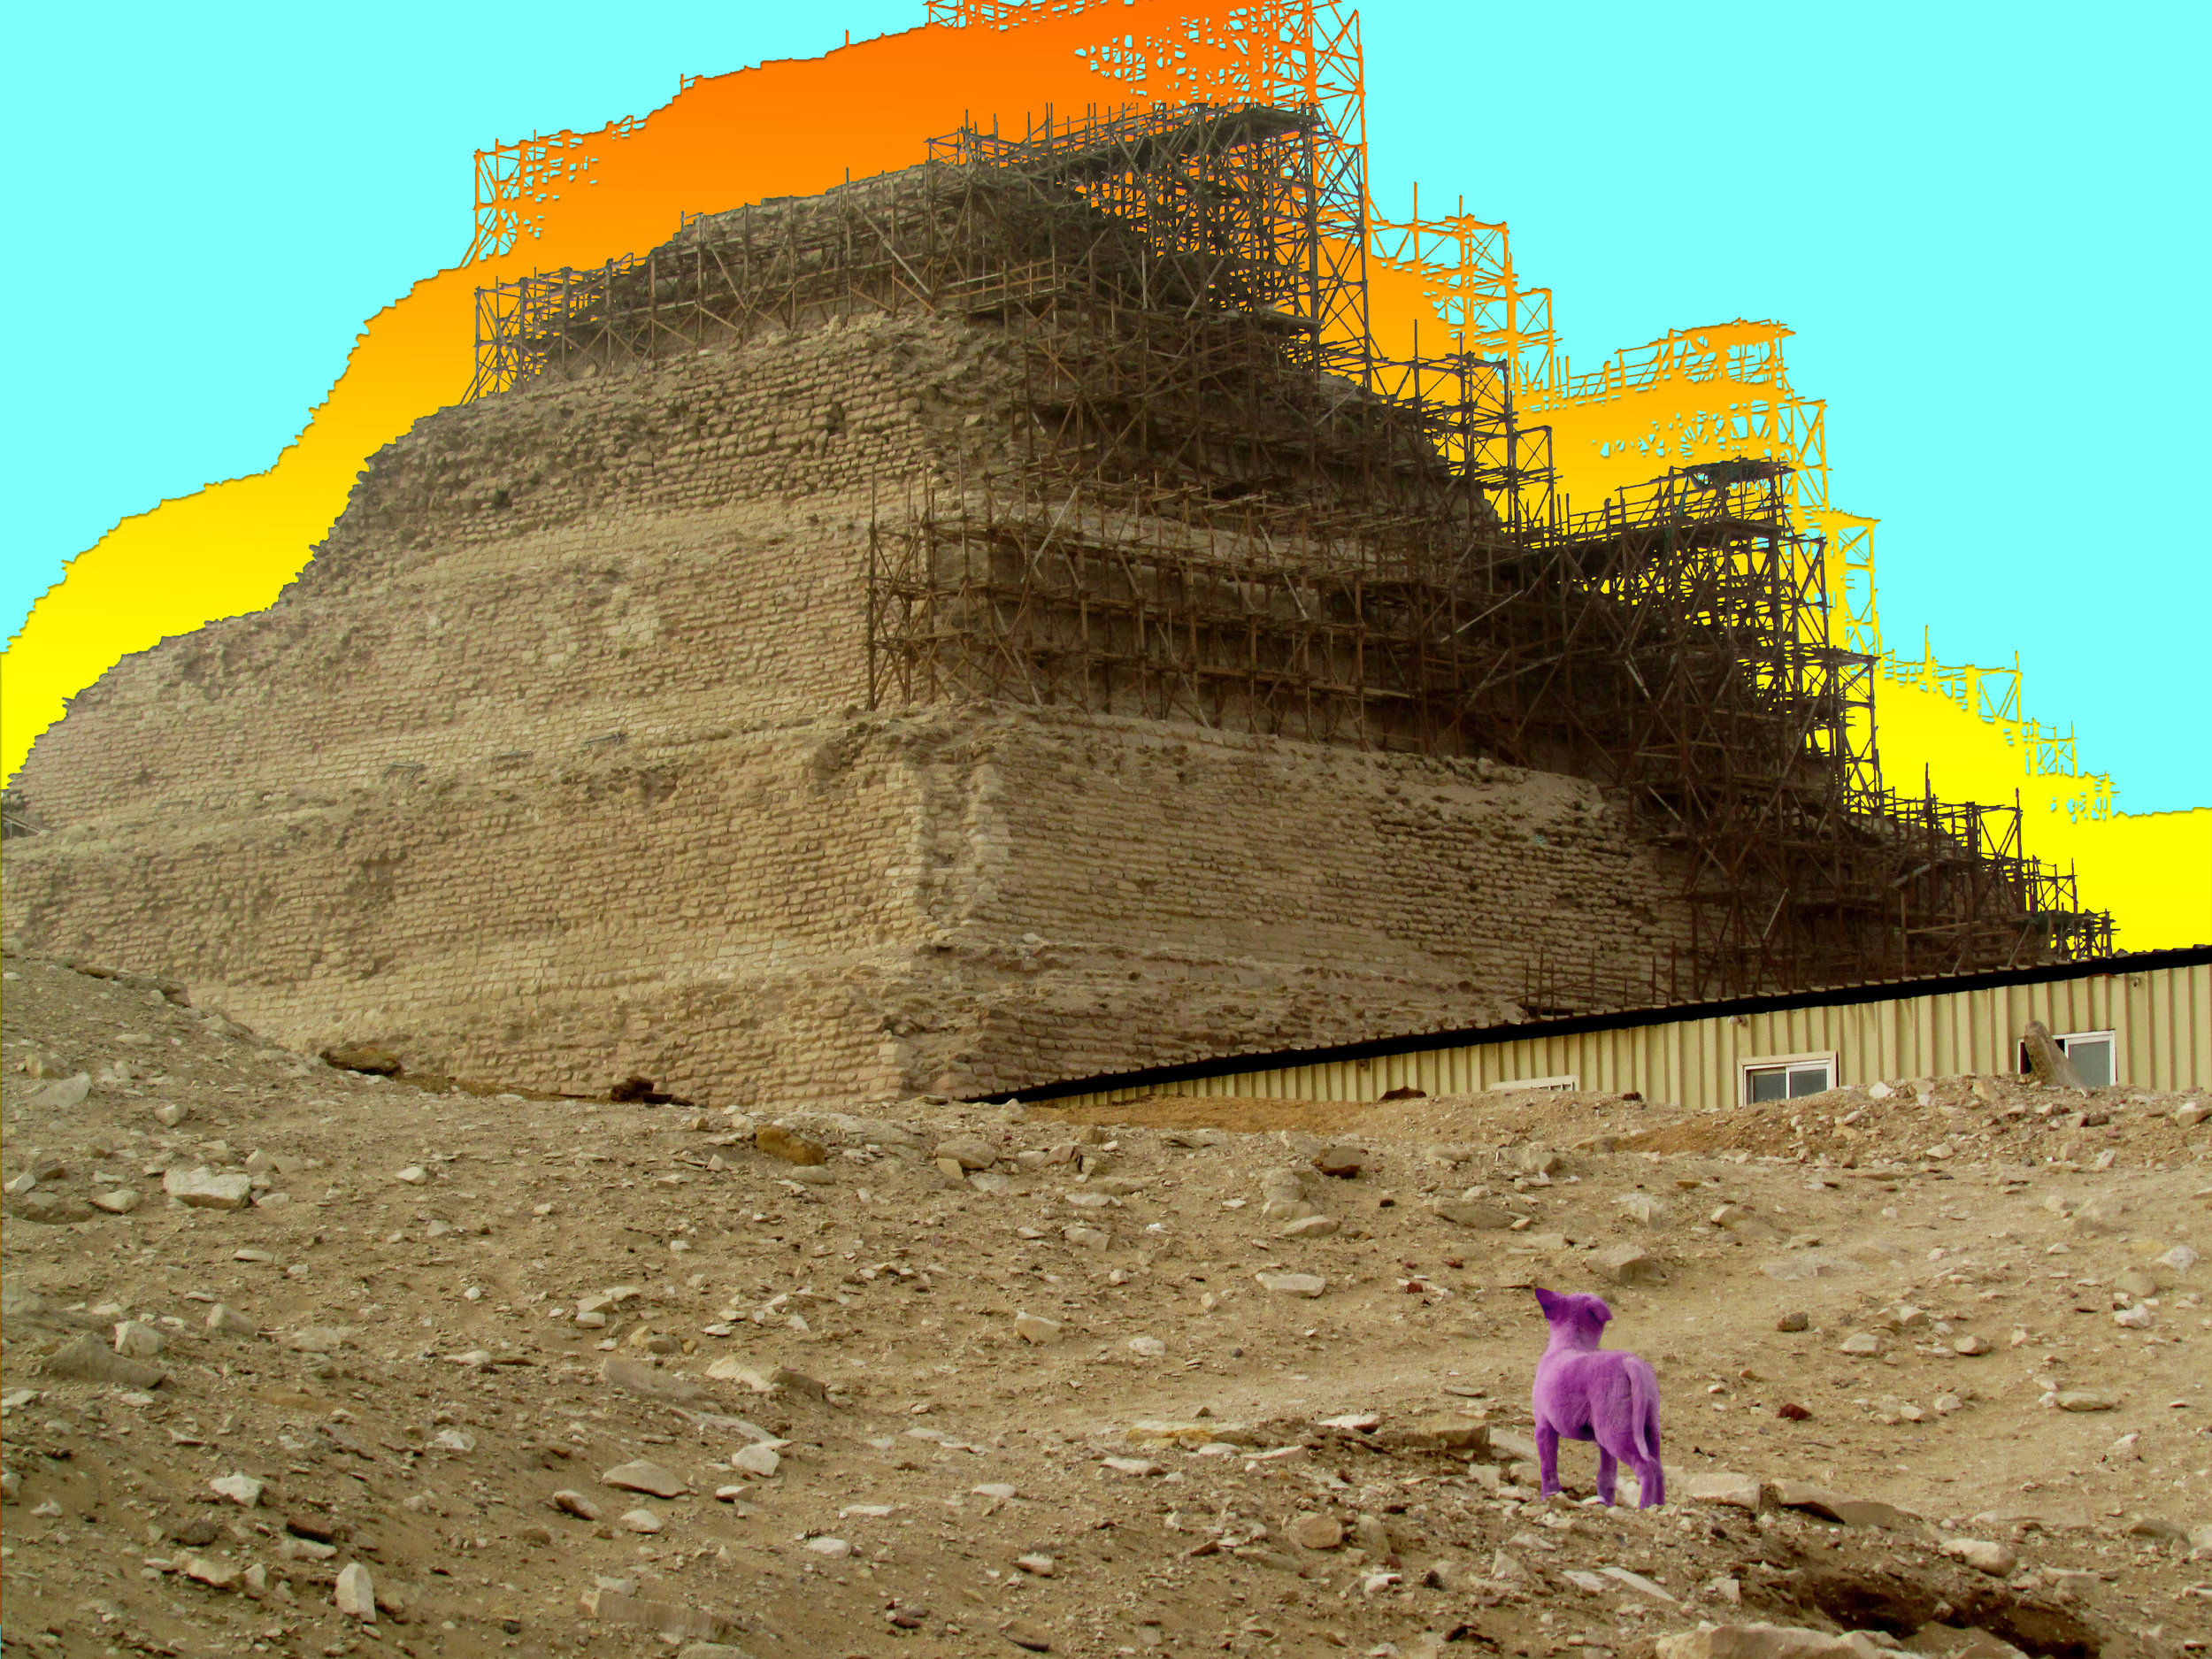 Dog Looking at the Step Pyramid | Egypt | Abstract Edit